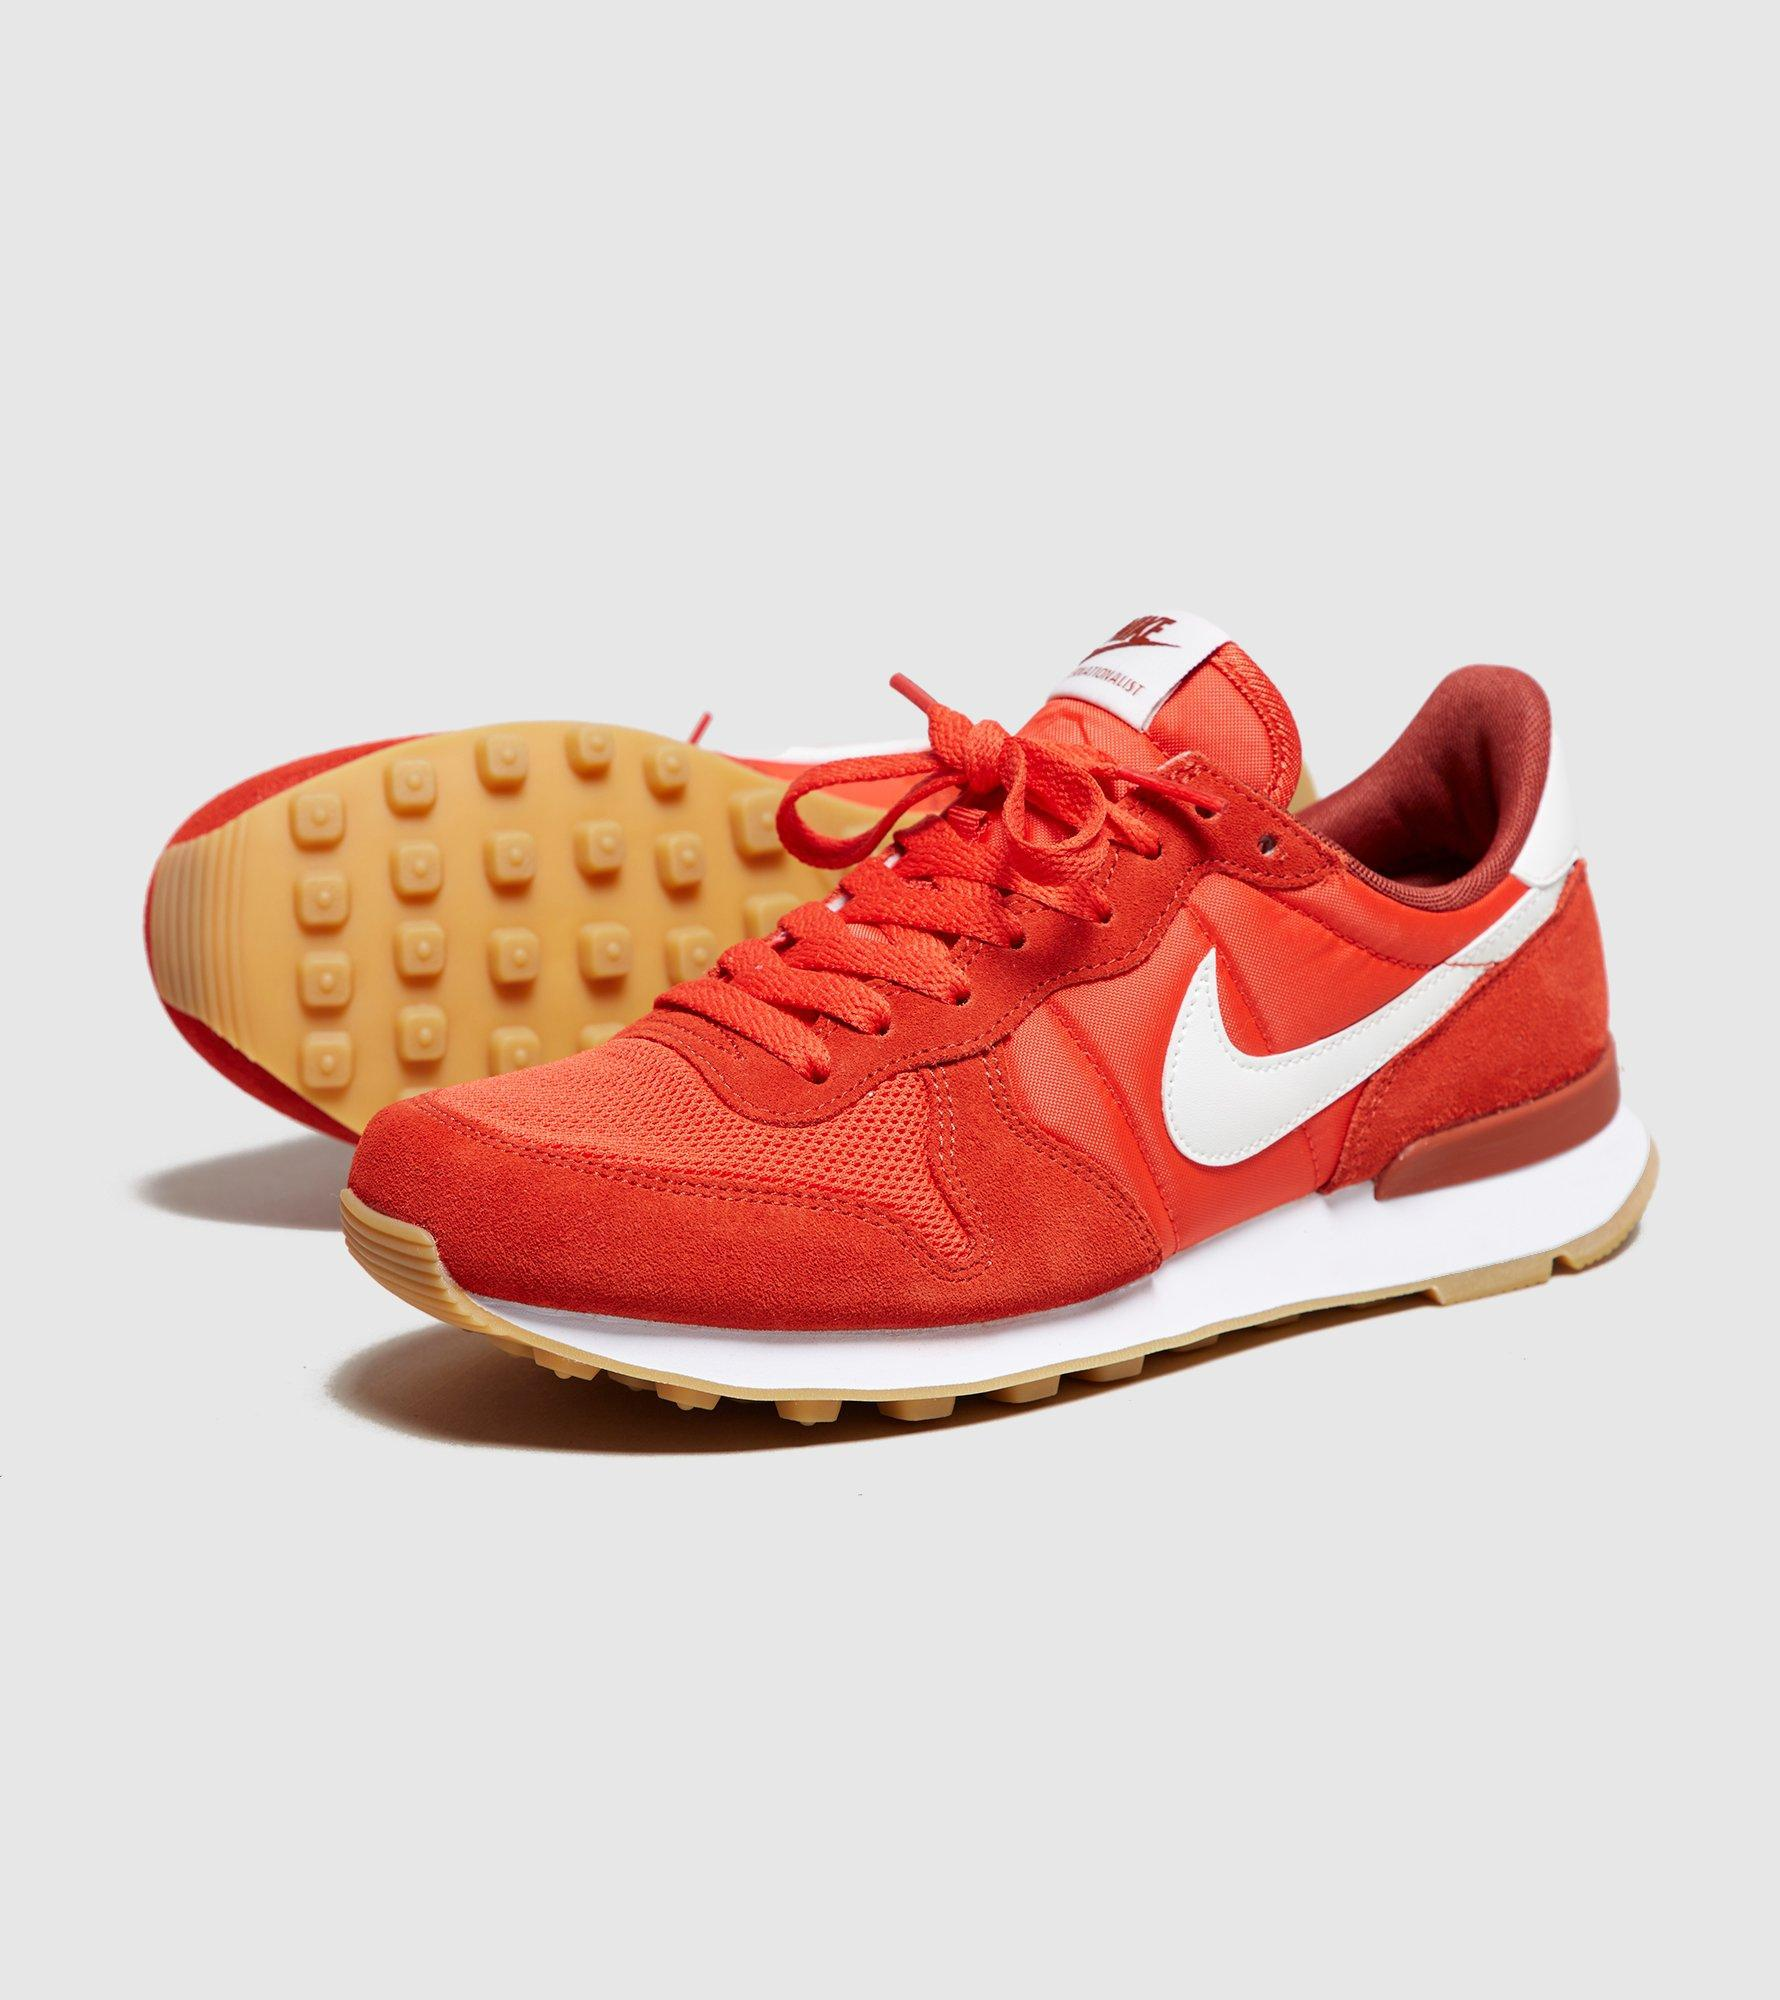 new style d7ae5 71b92 Lyst - Nike Internationalist Women s in Red